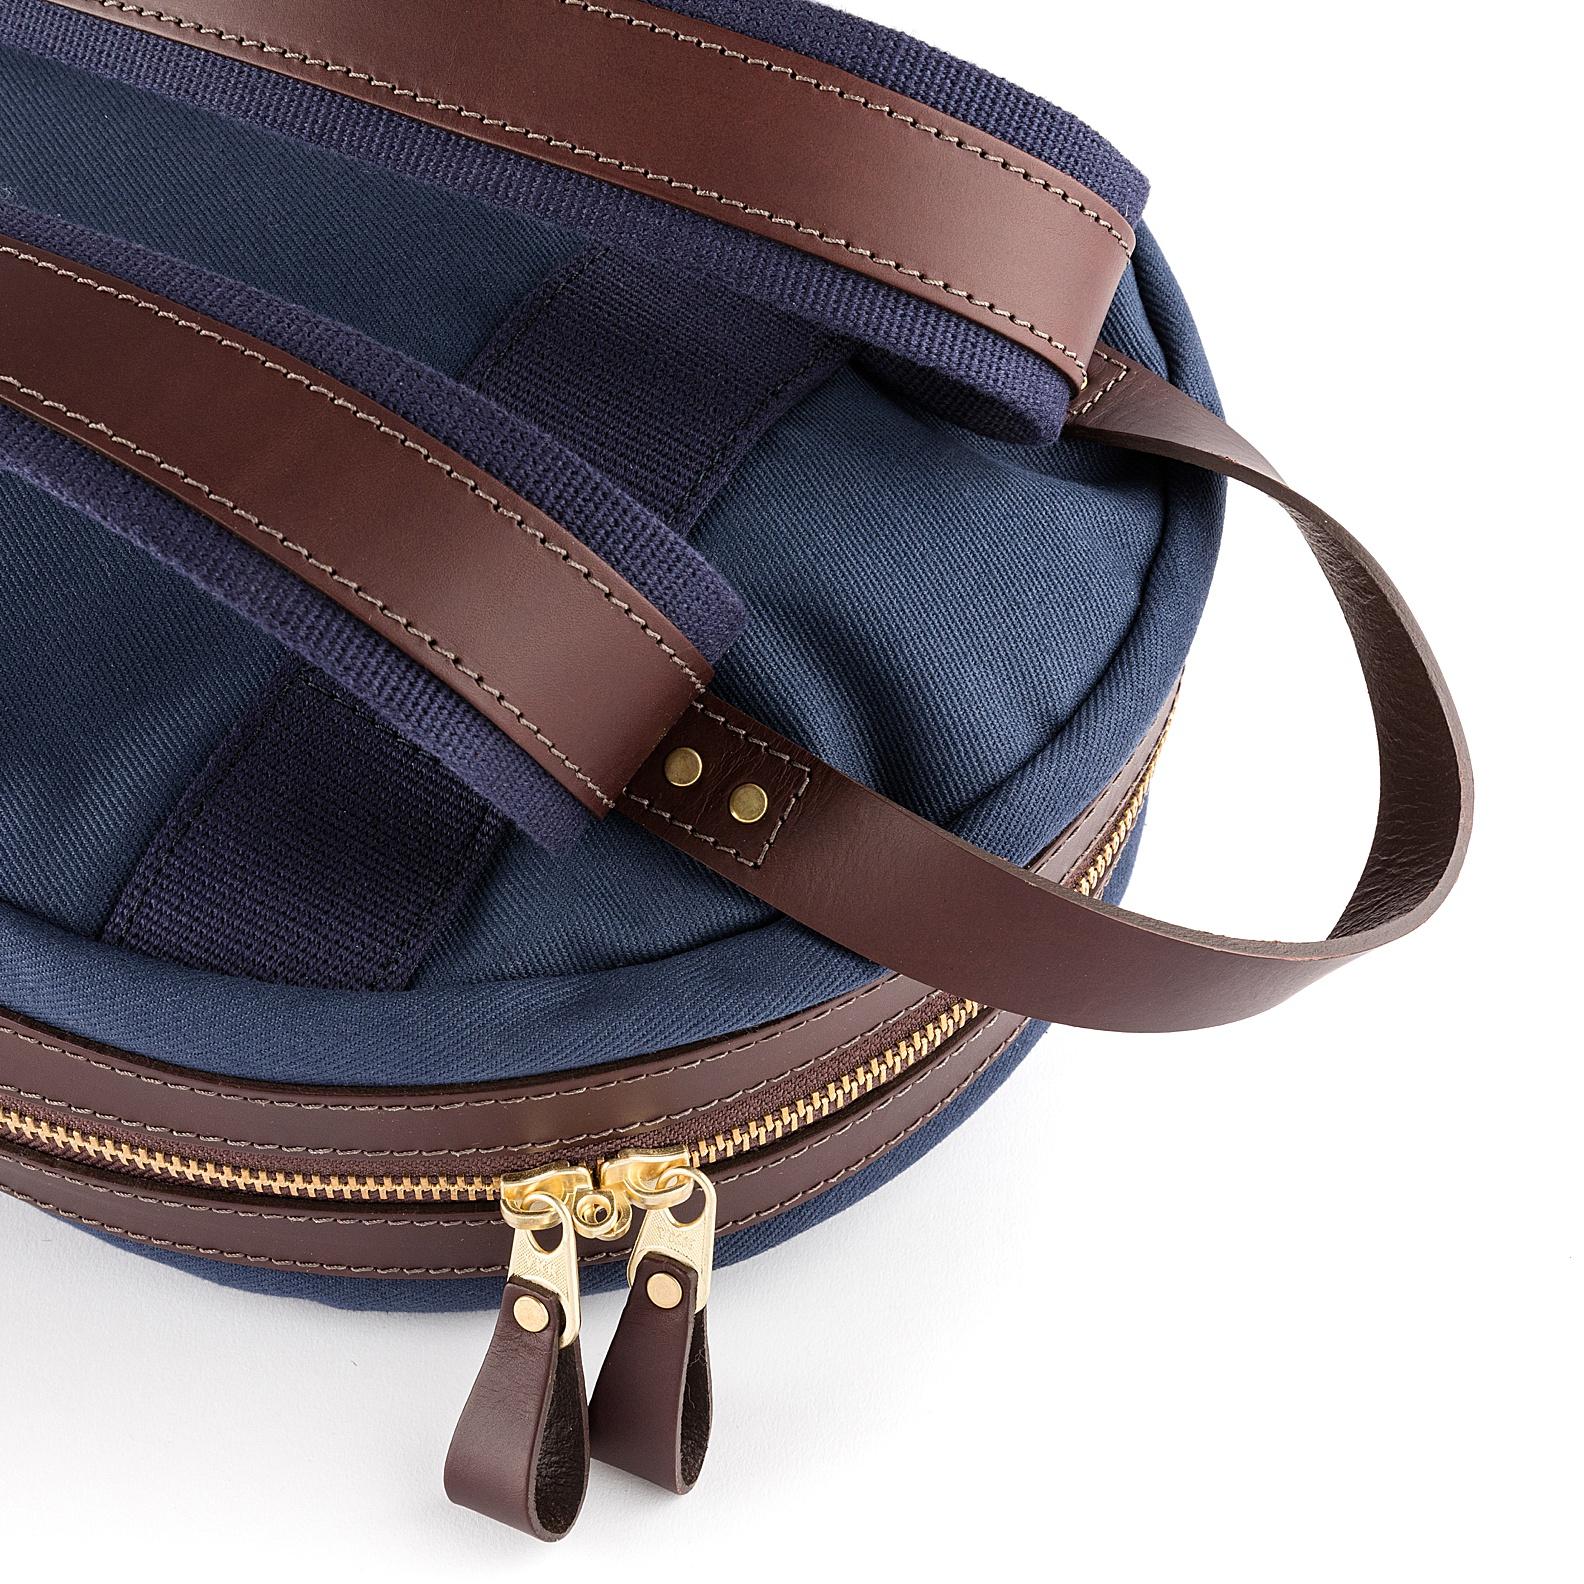 Alfie Reid British bag designer product photography